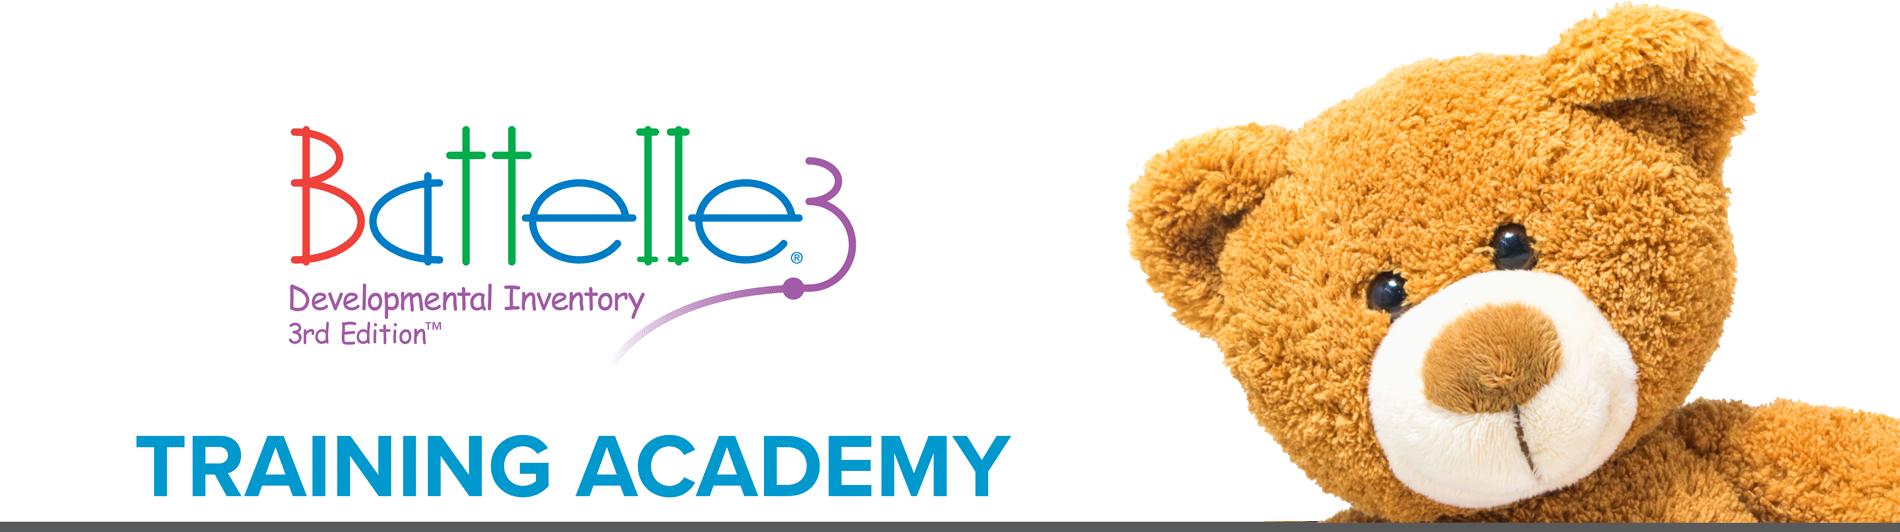 BDI-3-Training-Academy-Web-banner 3521